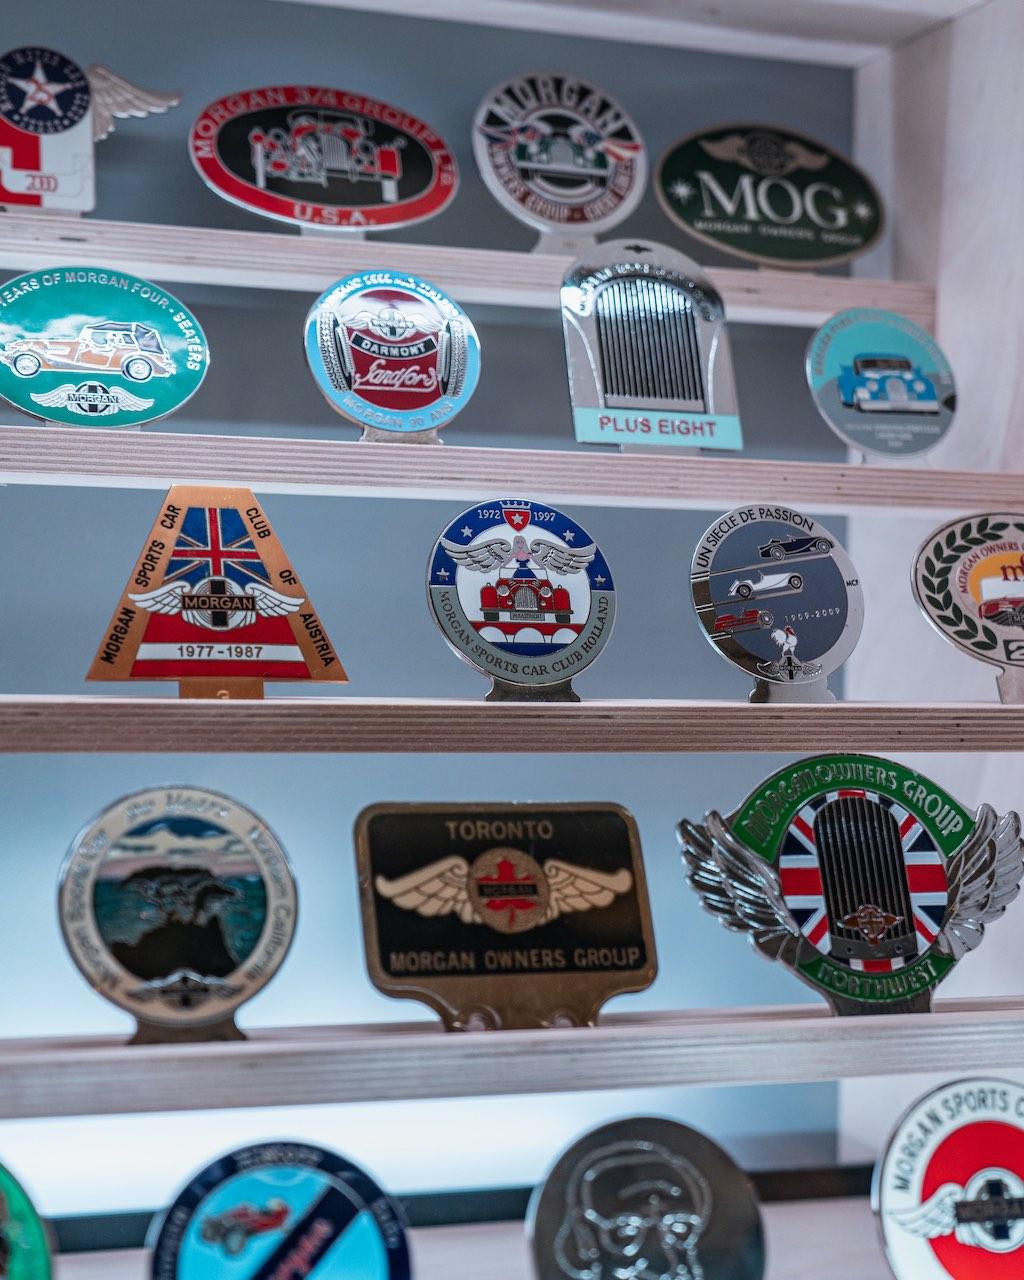 Morgan Motor Company opens new interactive museum